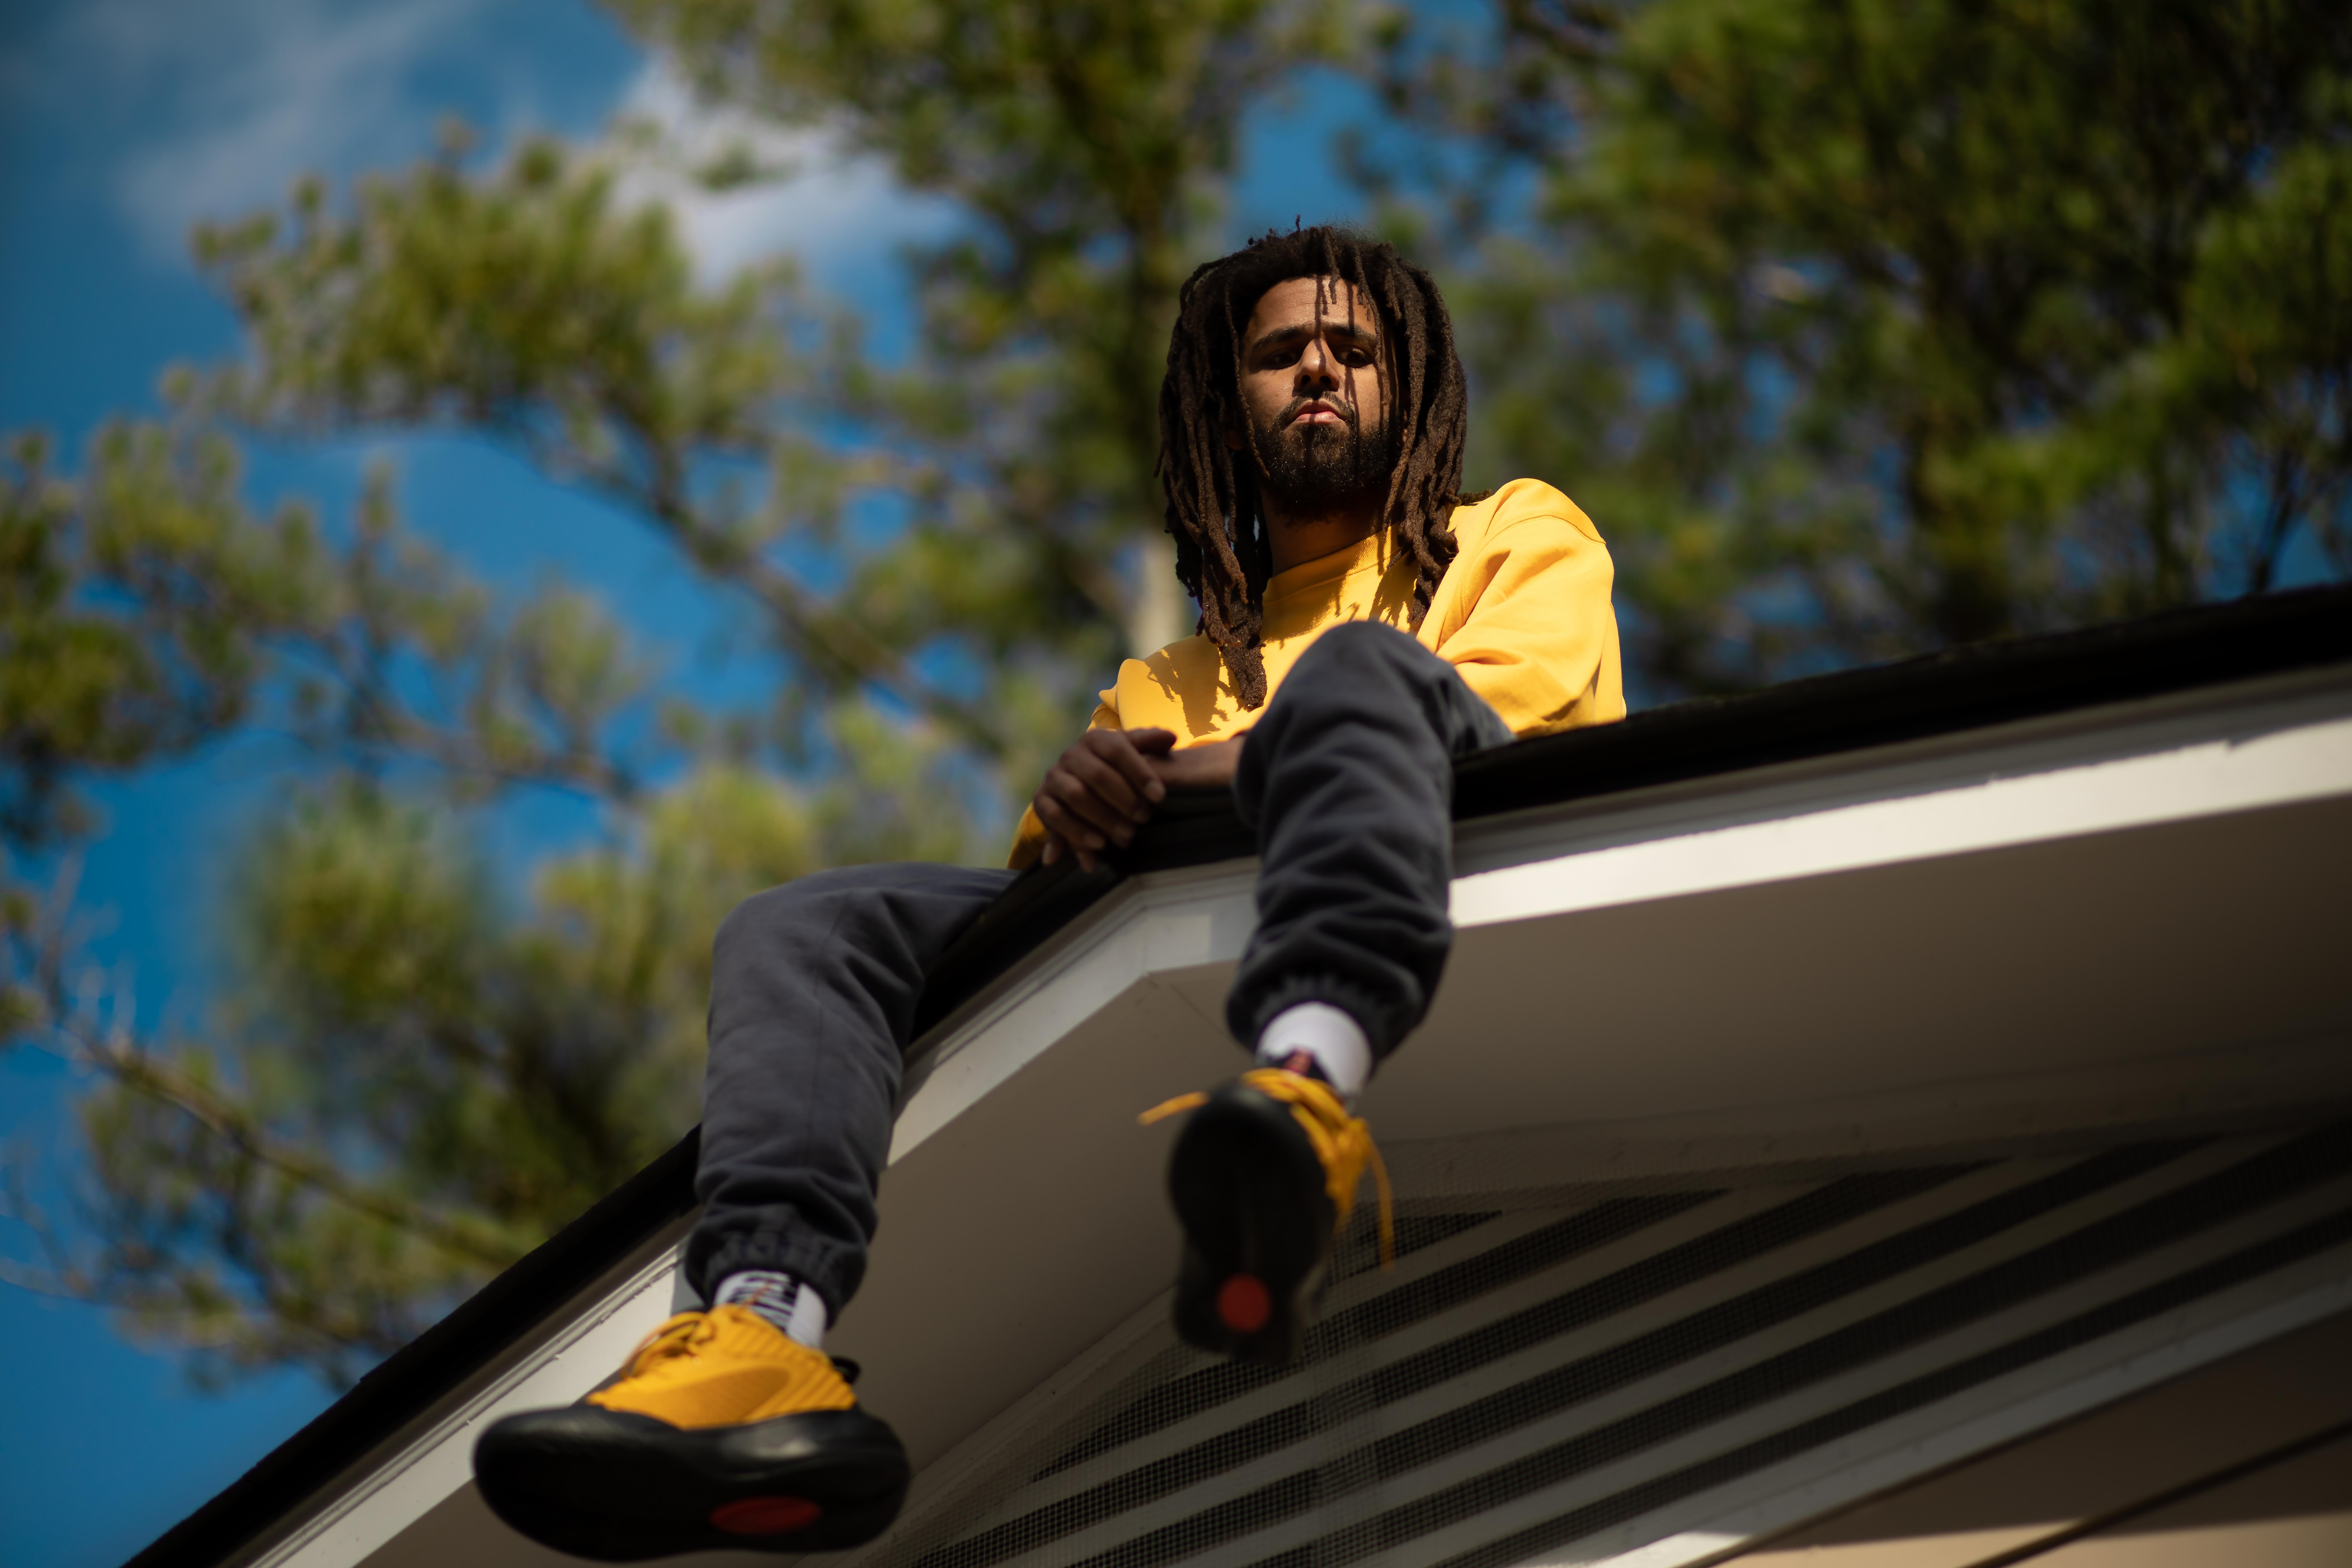 J. Cole Announces His 2nd Signature Basketball Sneaker, The PUMA DREAMER 2